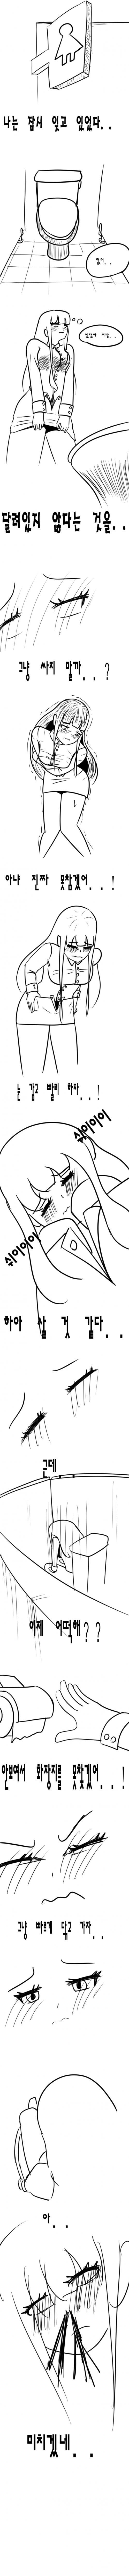 viewimage.php?id=2ebcc232eadd36&no=24b0d769e1d32ca73fec81fa11d02831b46f6c3837711f4400726d62dc68225a8a20c694b31deba51ec85ab2202c86682ce8c383b8e1953ddf1dac3a89393c73df38